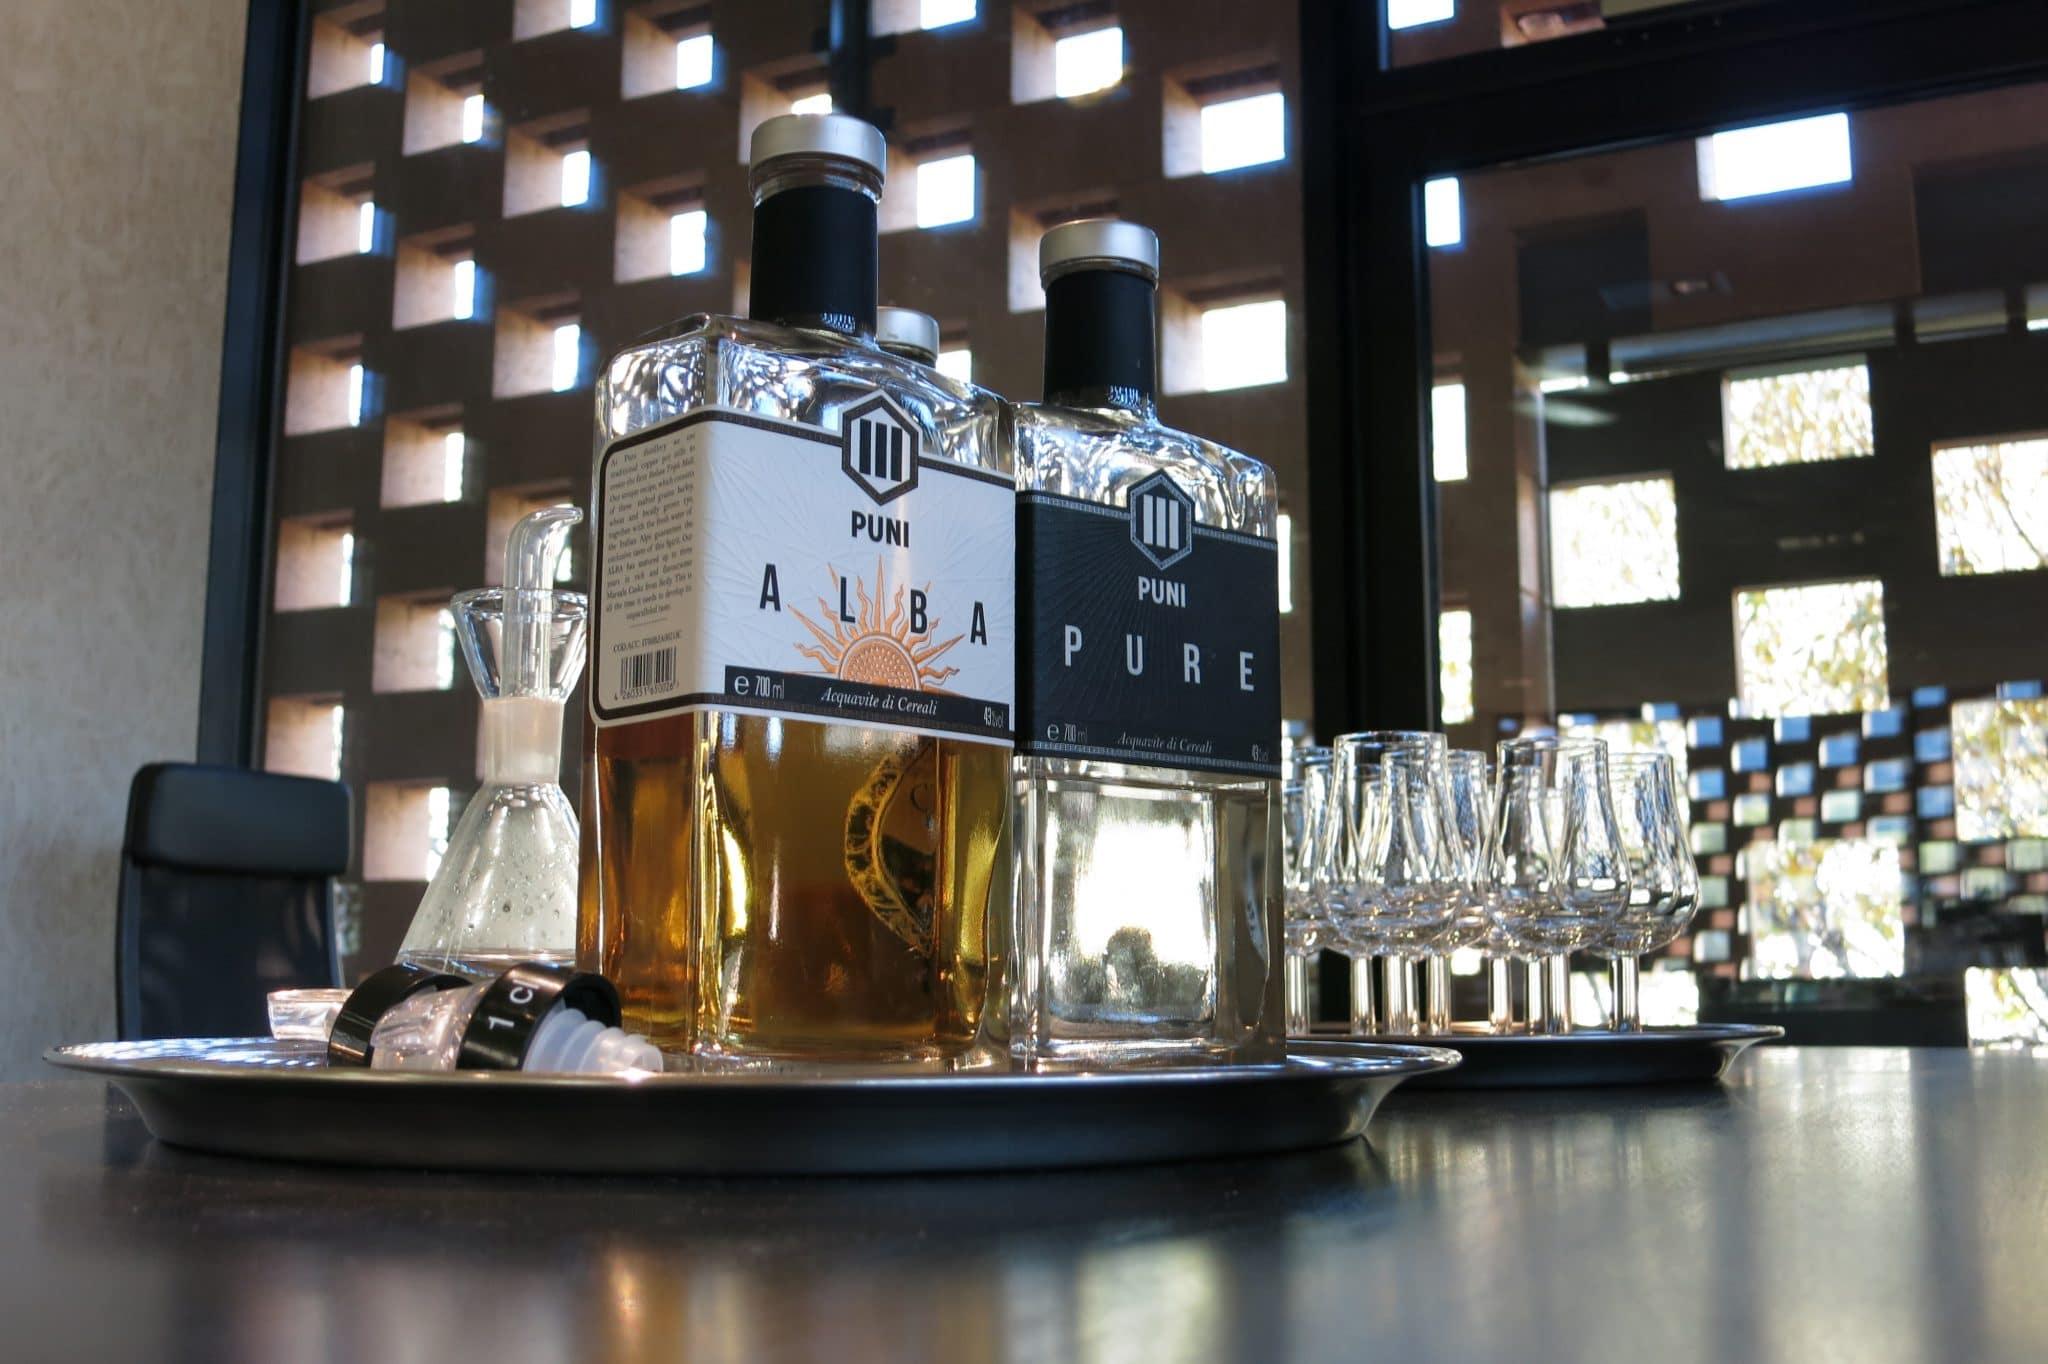 Der erste Whisky der PUNI- Destillerie